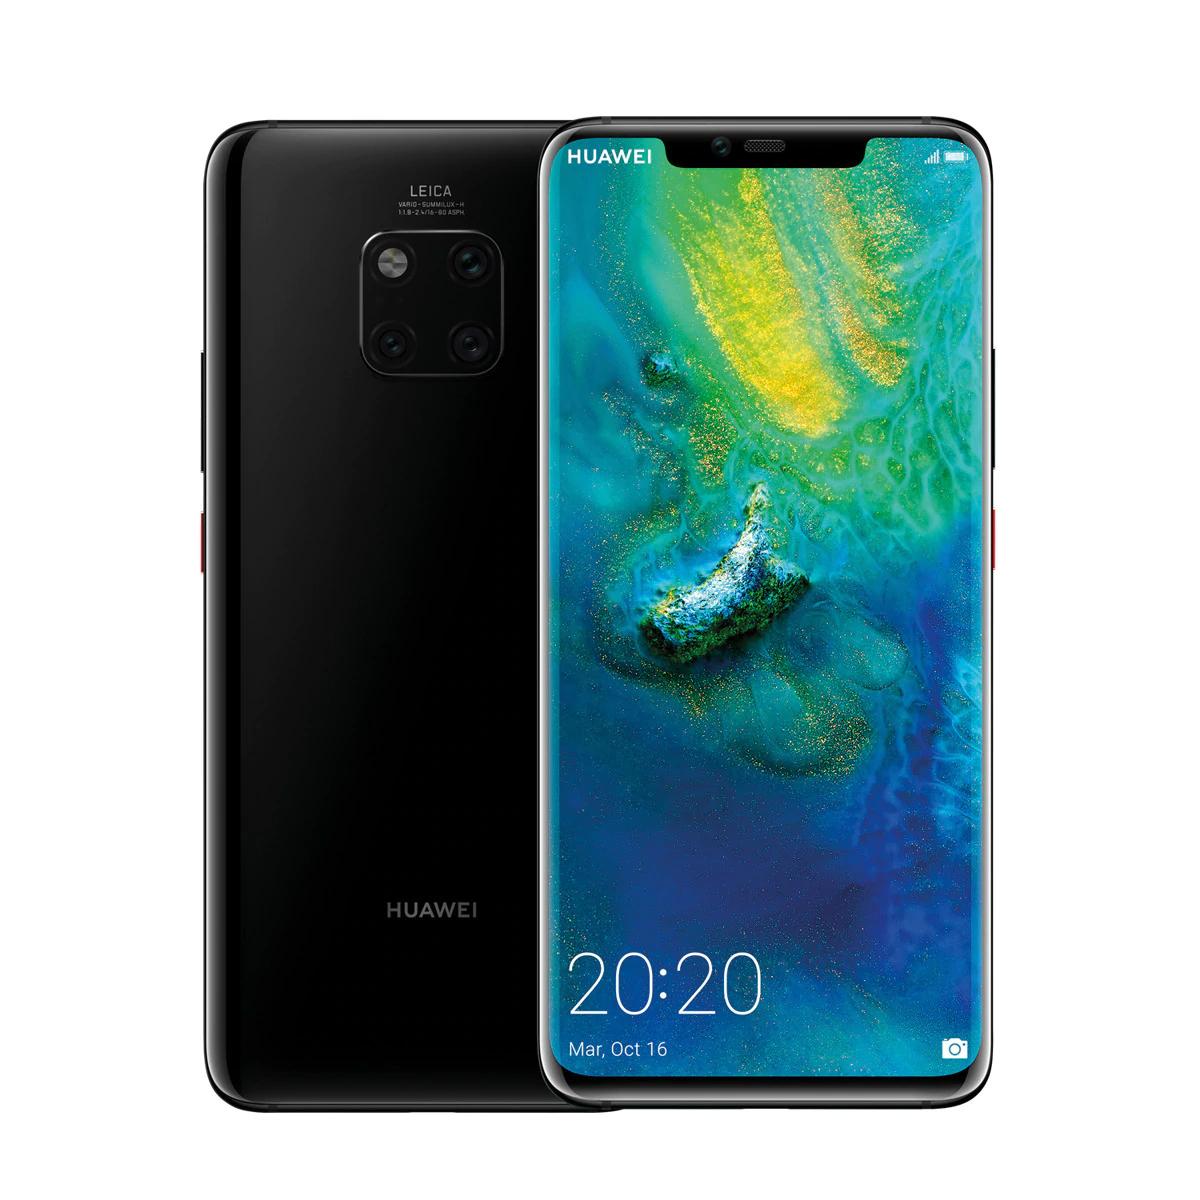 Huawei Mate 20 Pro 6GB + 128GB Dual Sim Negro móvil libre